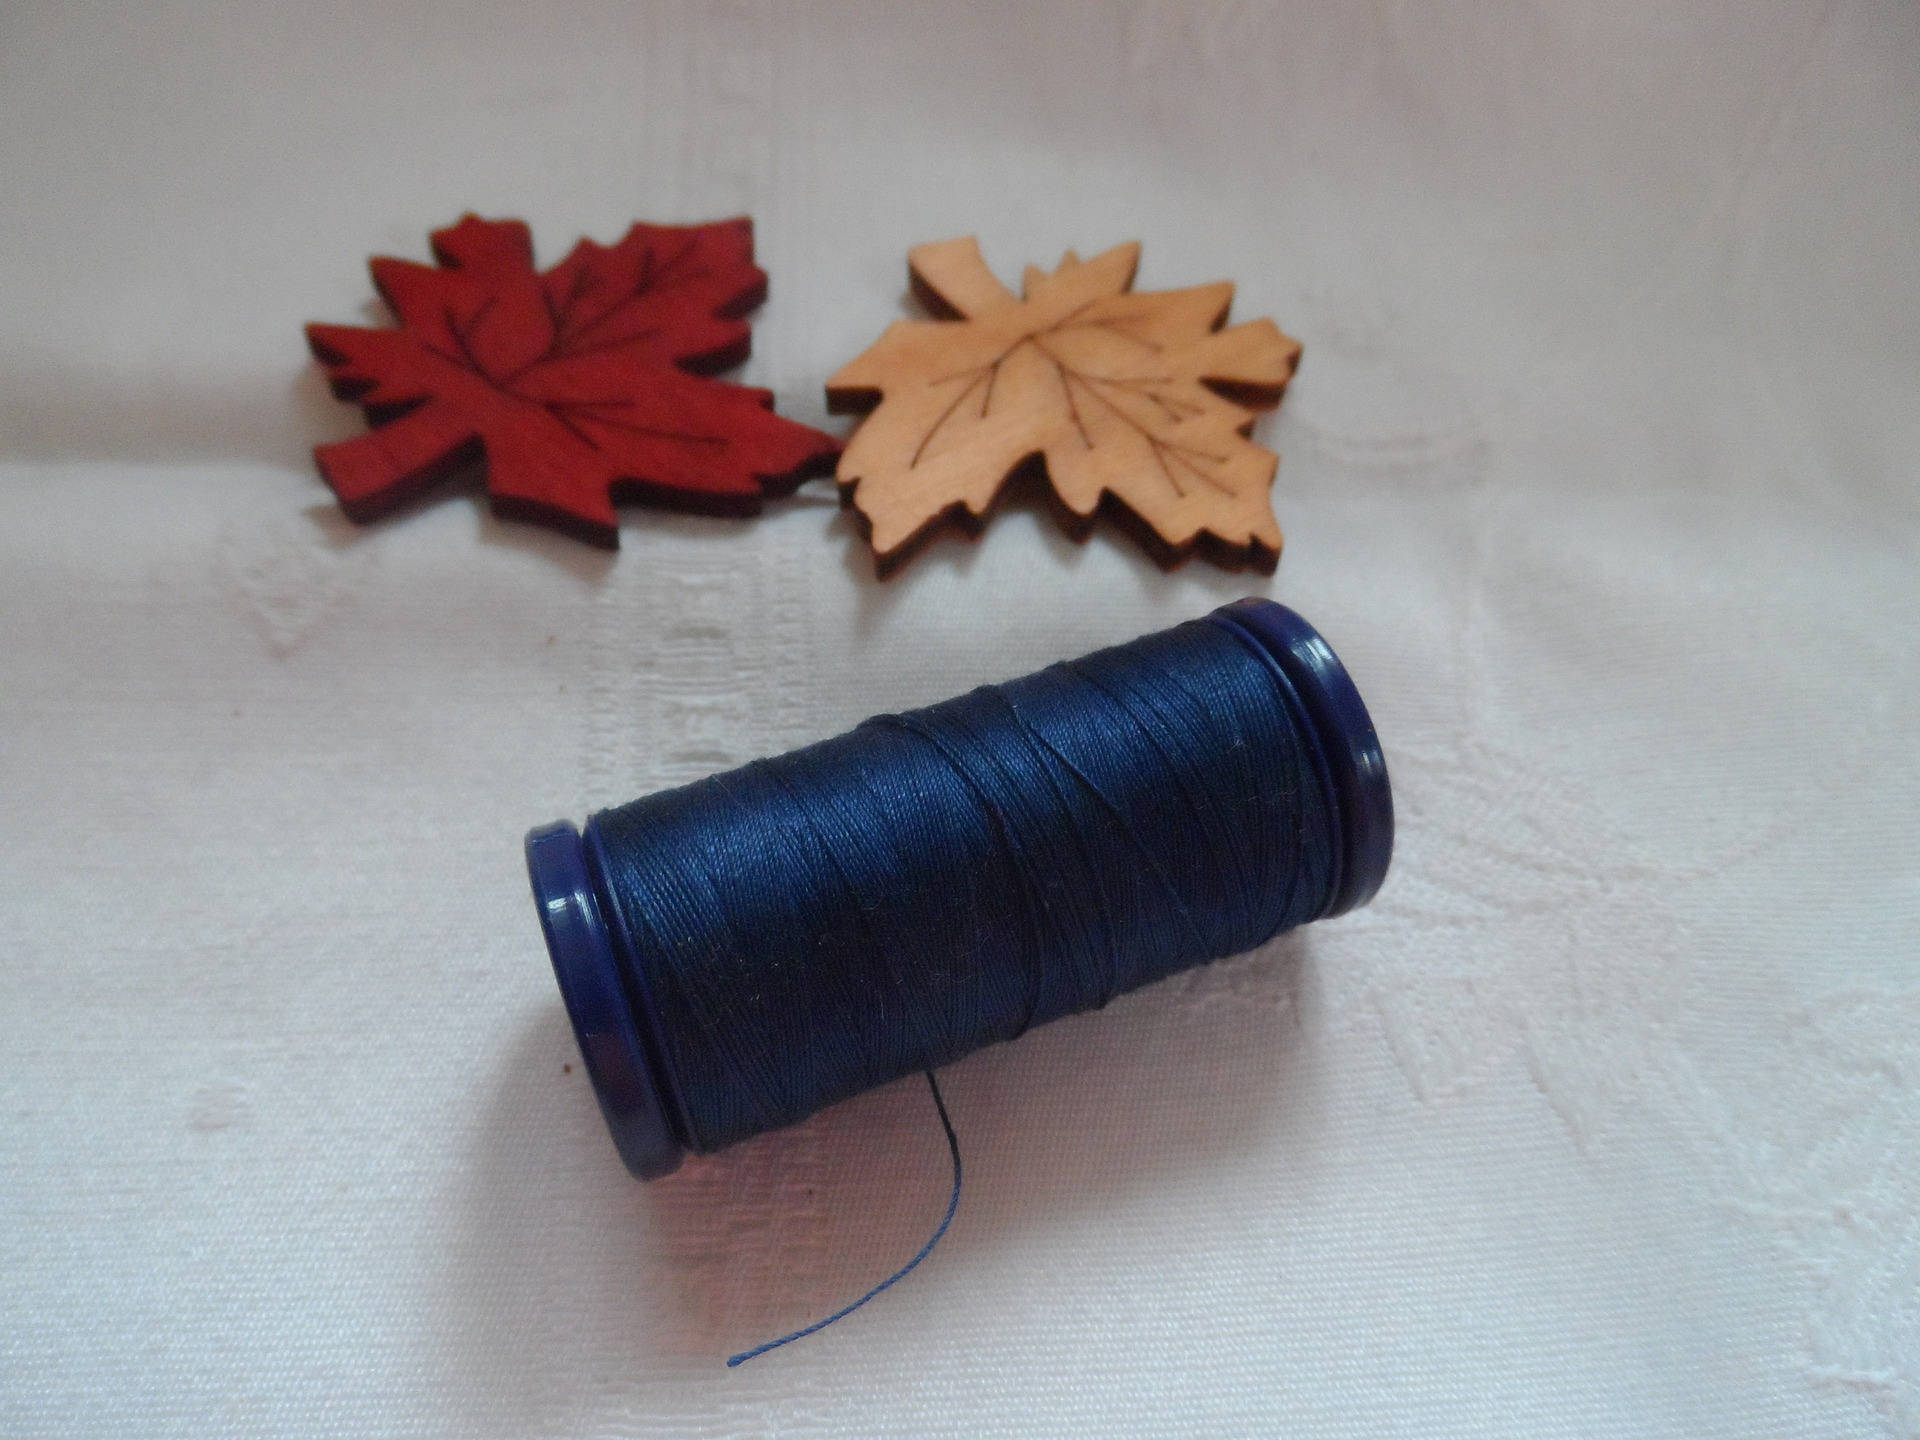 bobine de fils à coudre 100% polyester bobine de couleur bleu marine